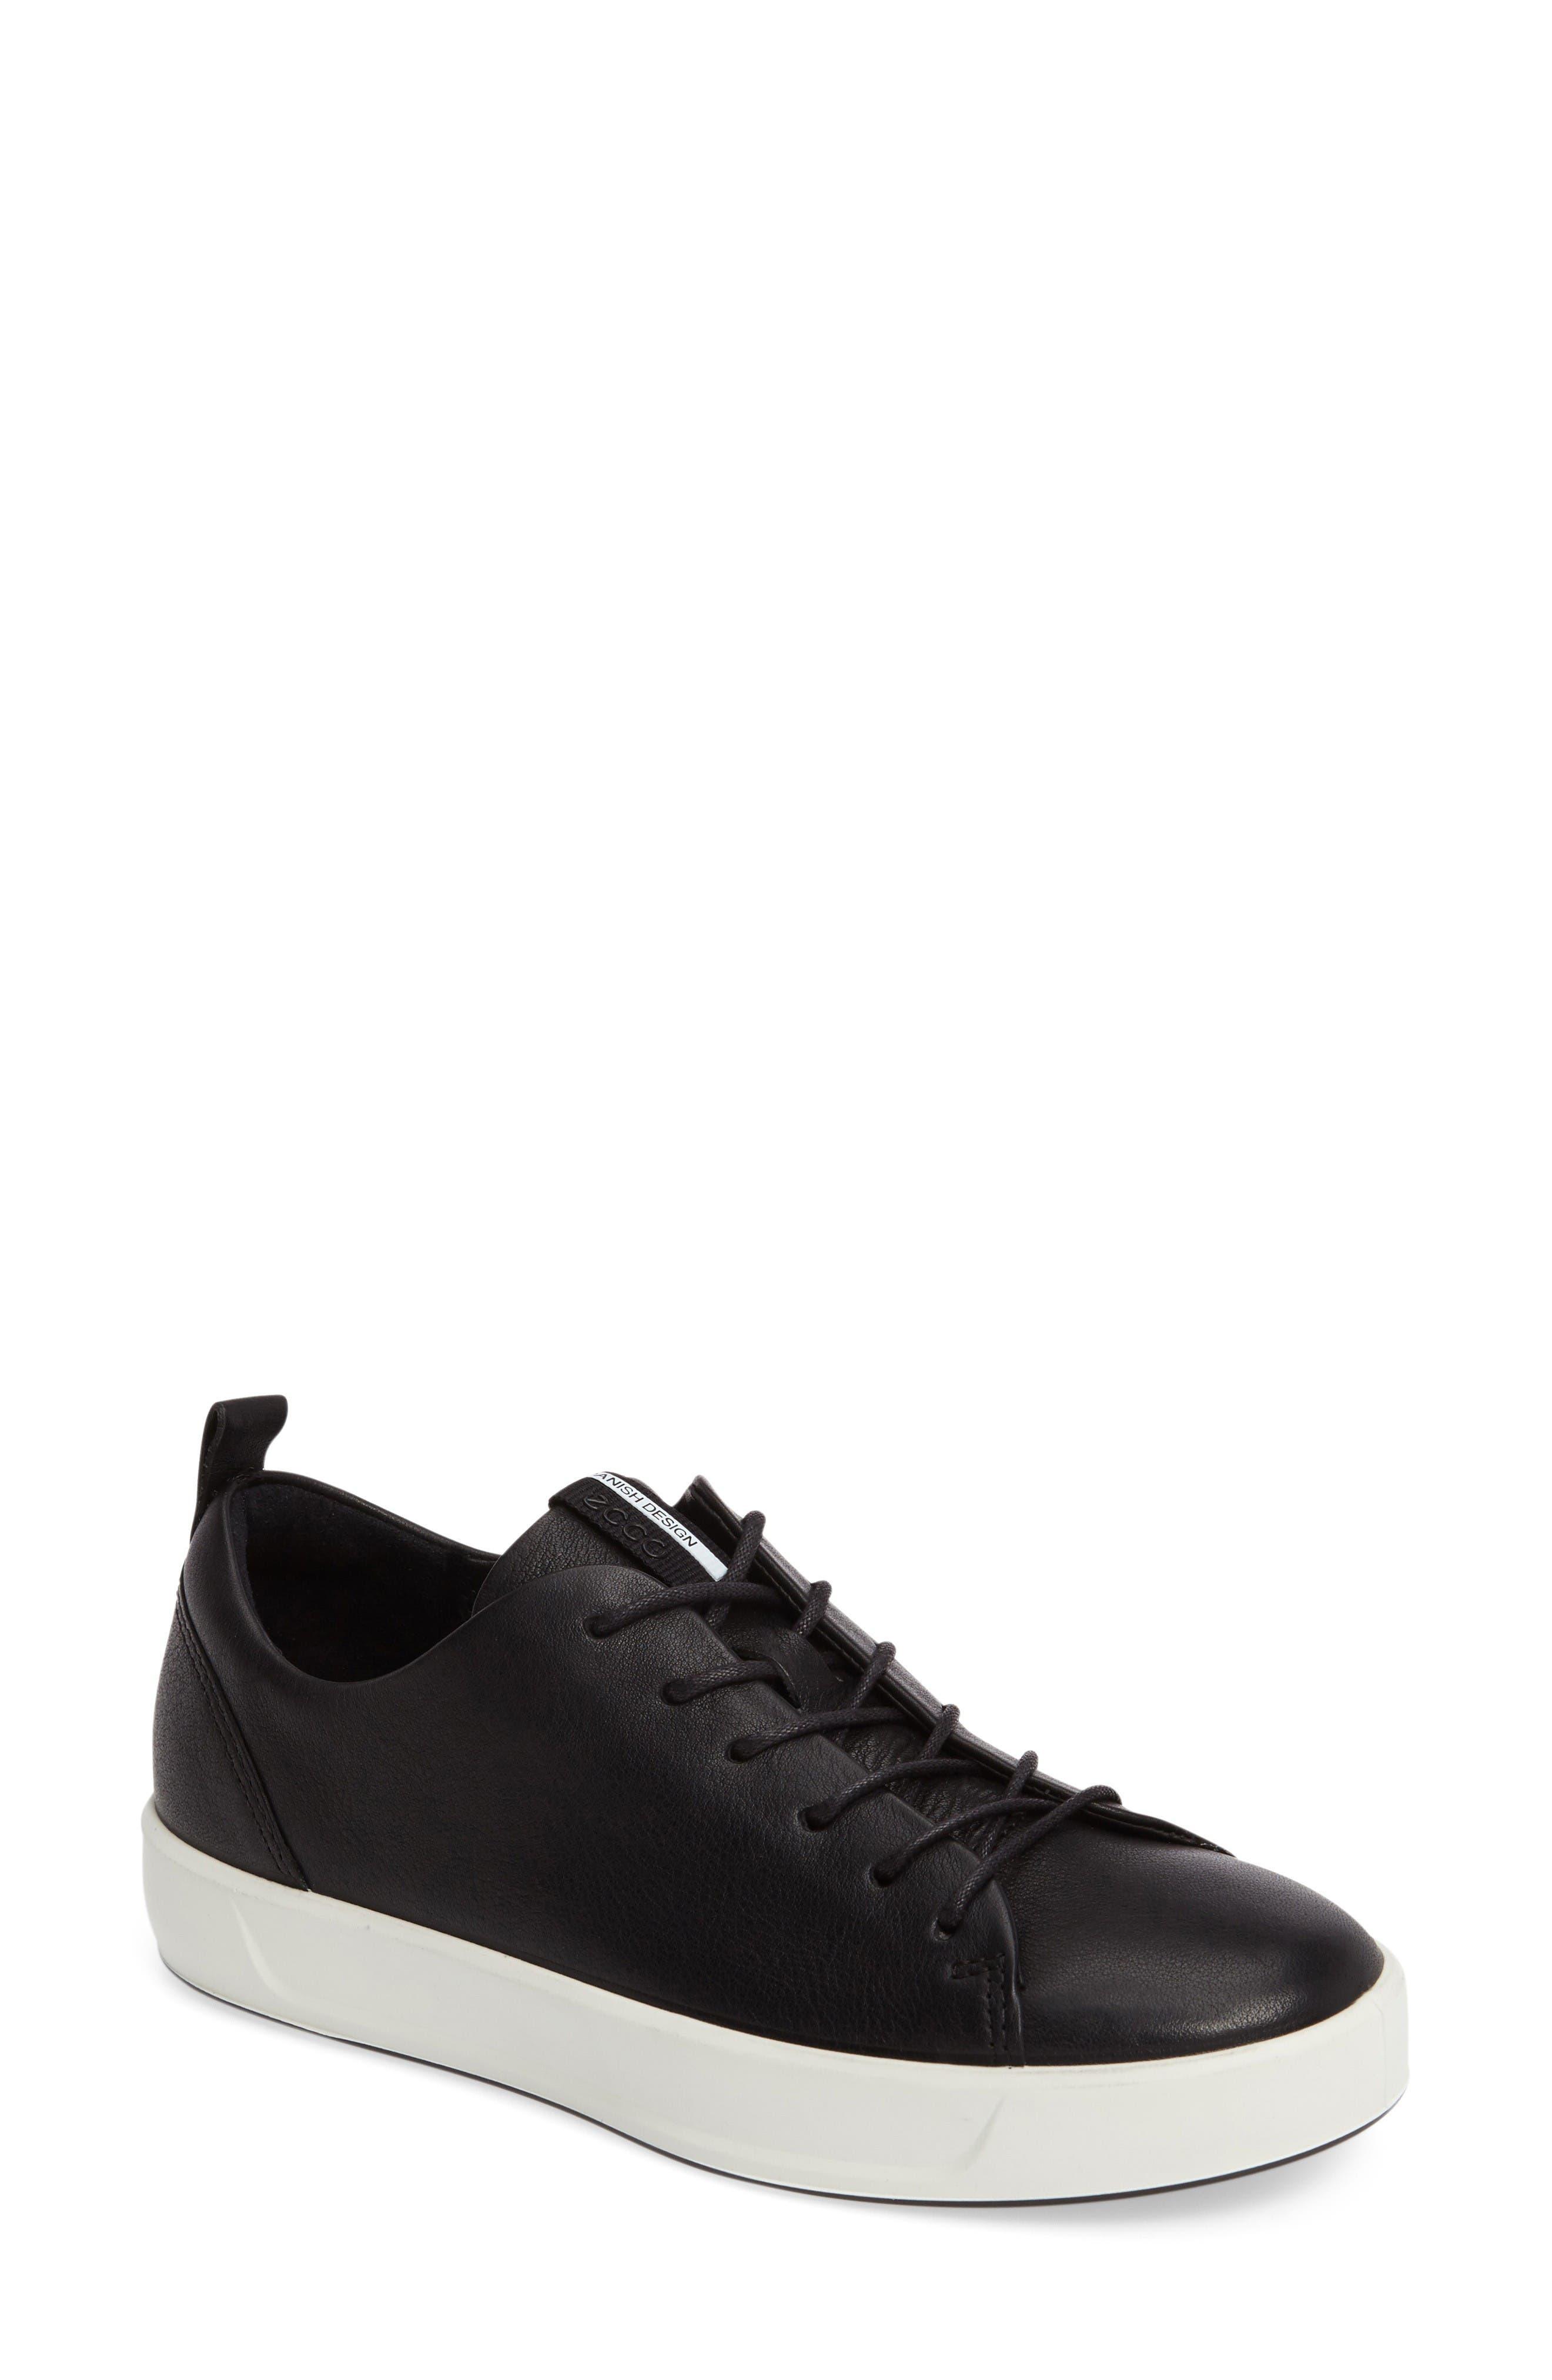 Main Image - ECCO Soft 8 Sneaker (Women)